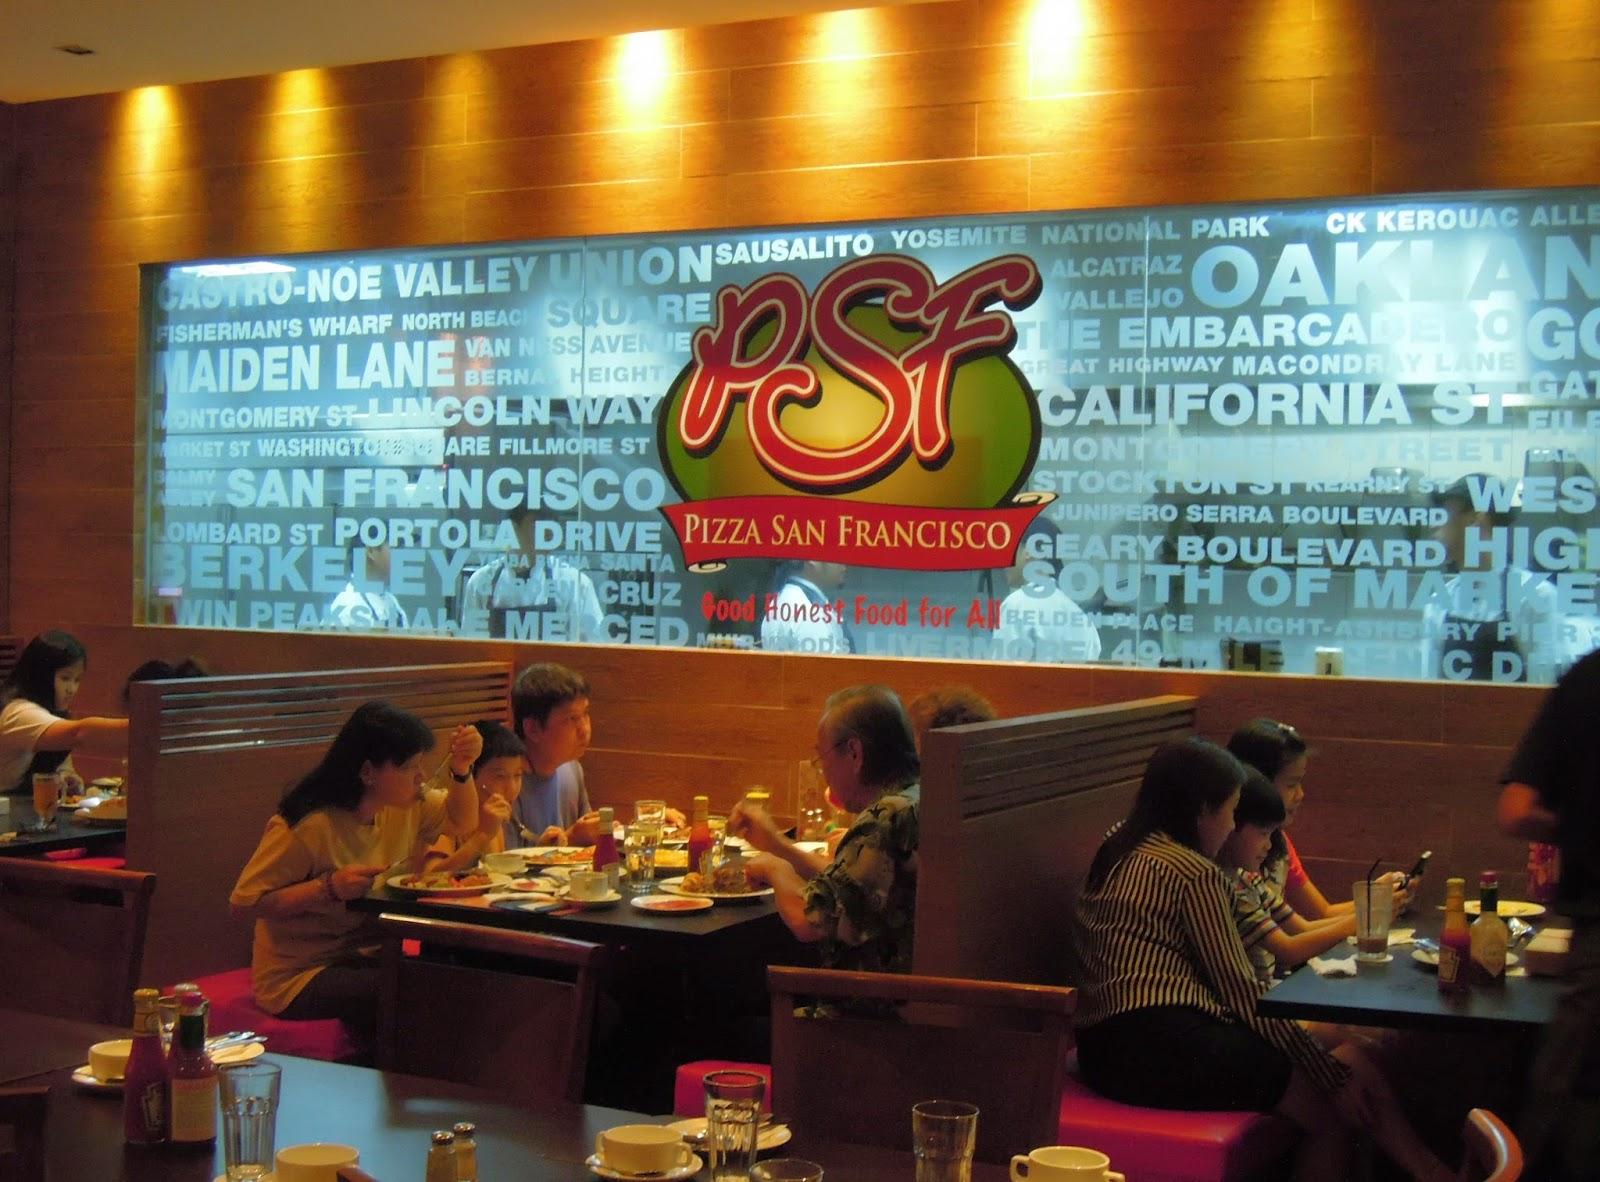 Dreamer~: Pizza San Francisco food review